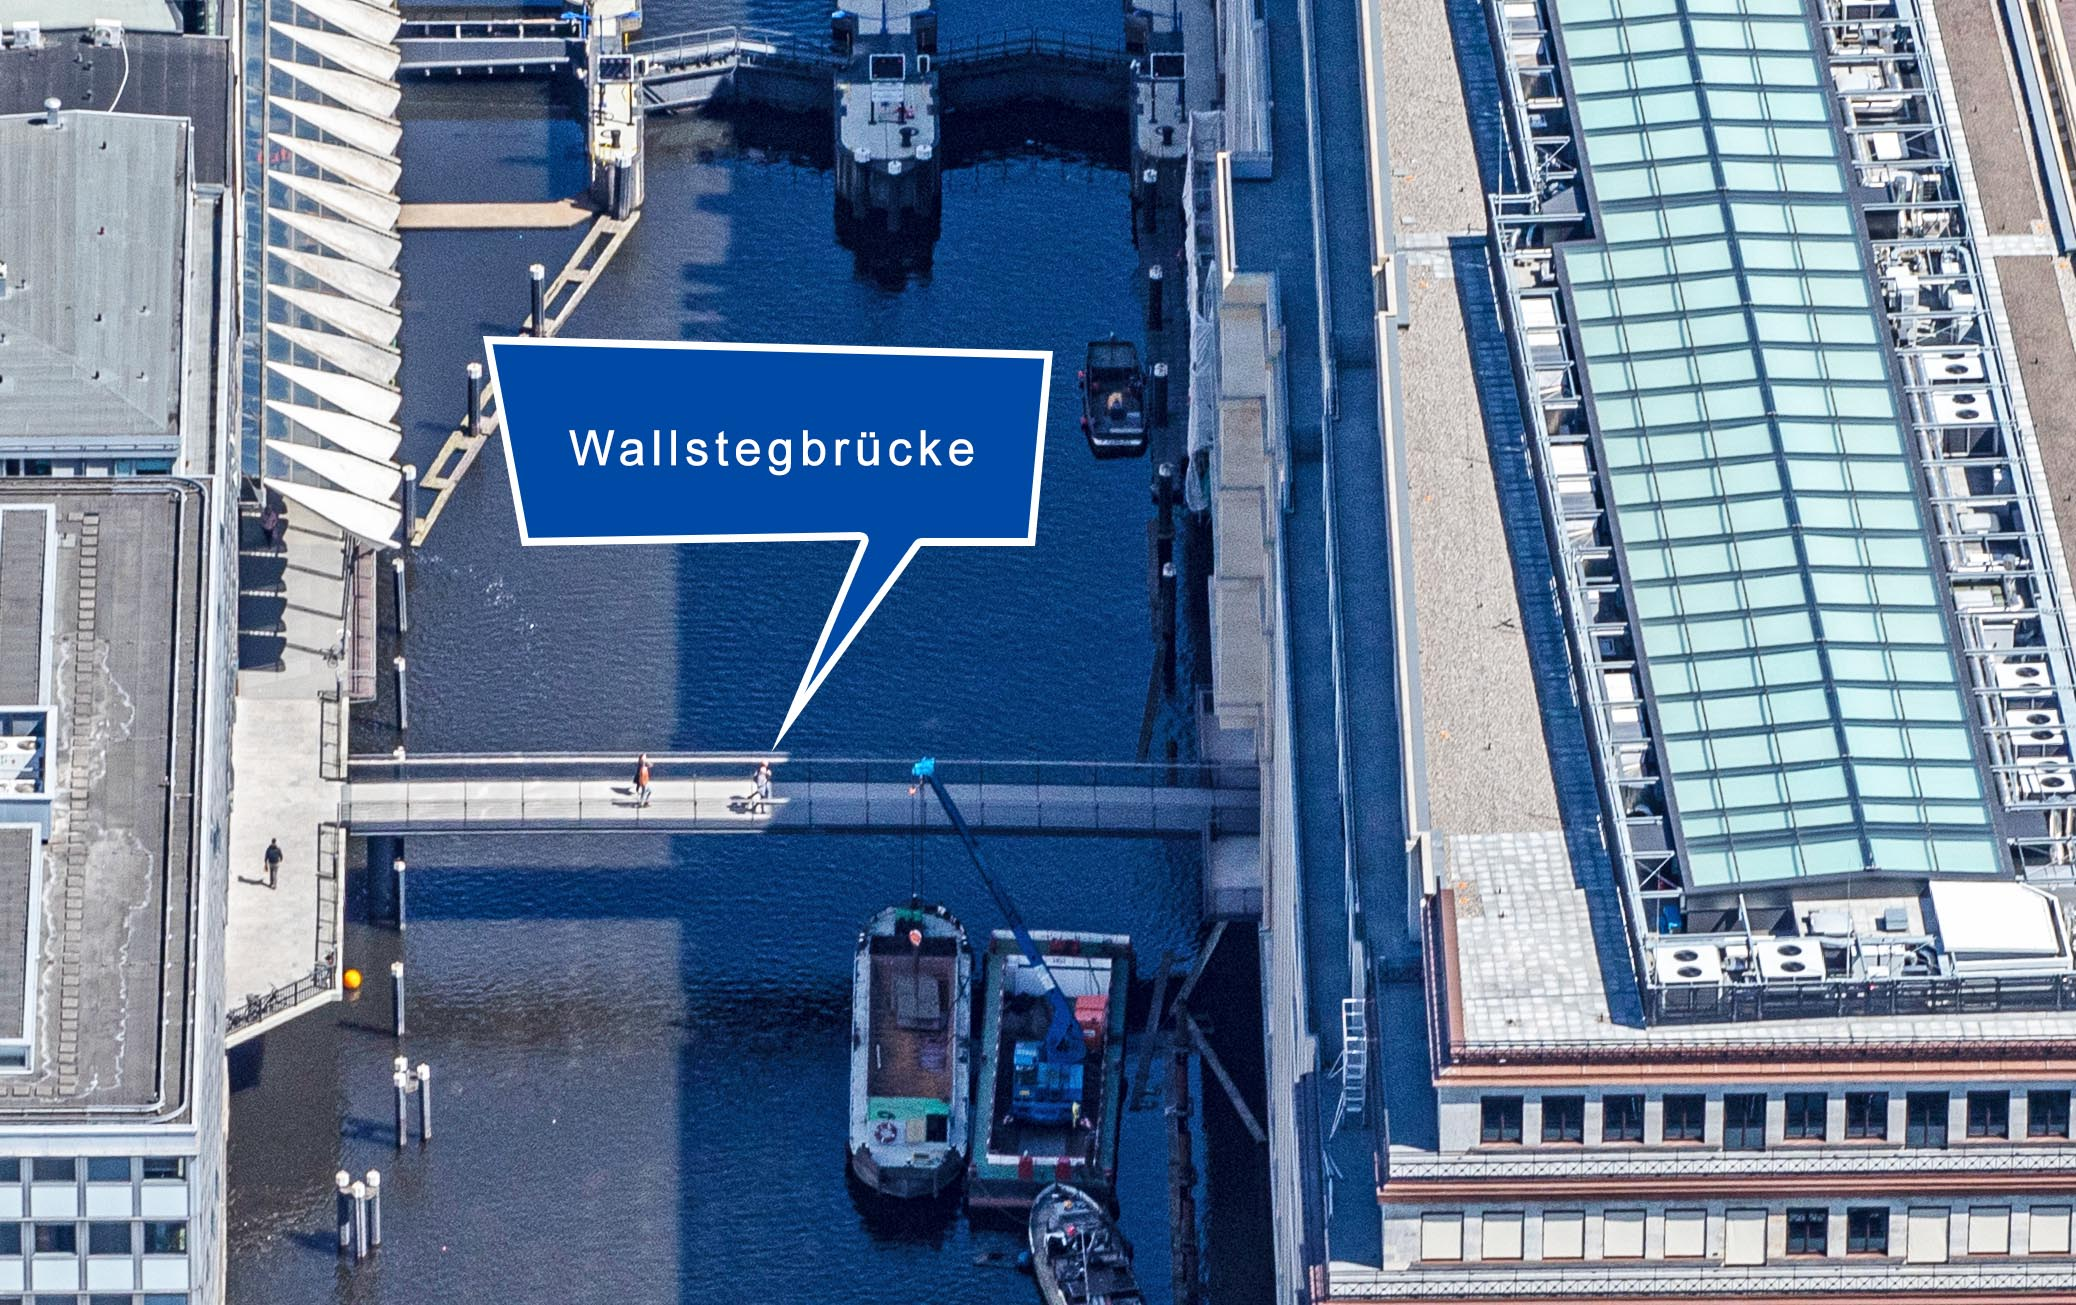 Link zu Hamburg Wallstegbrücke. Luftaufnahme